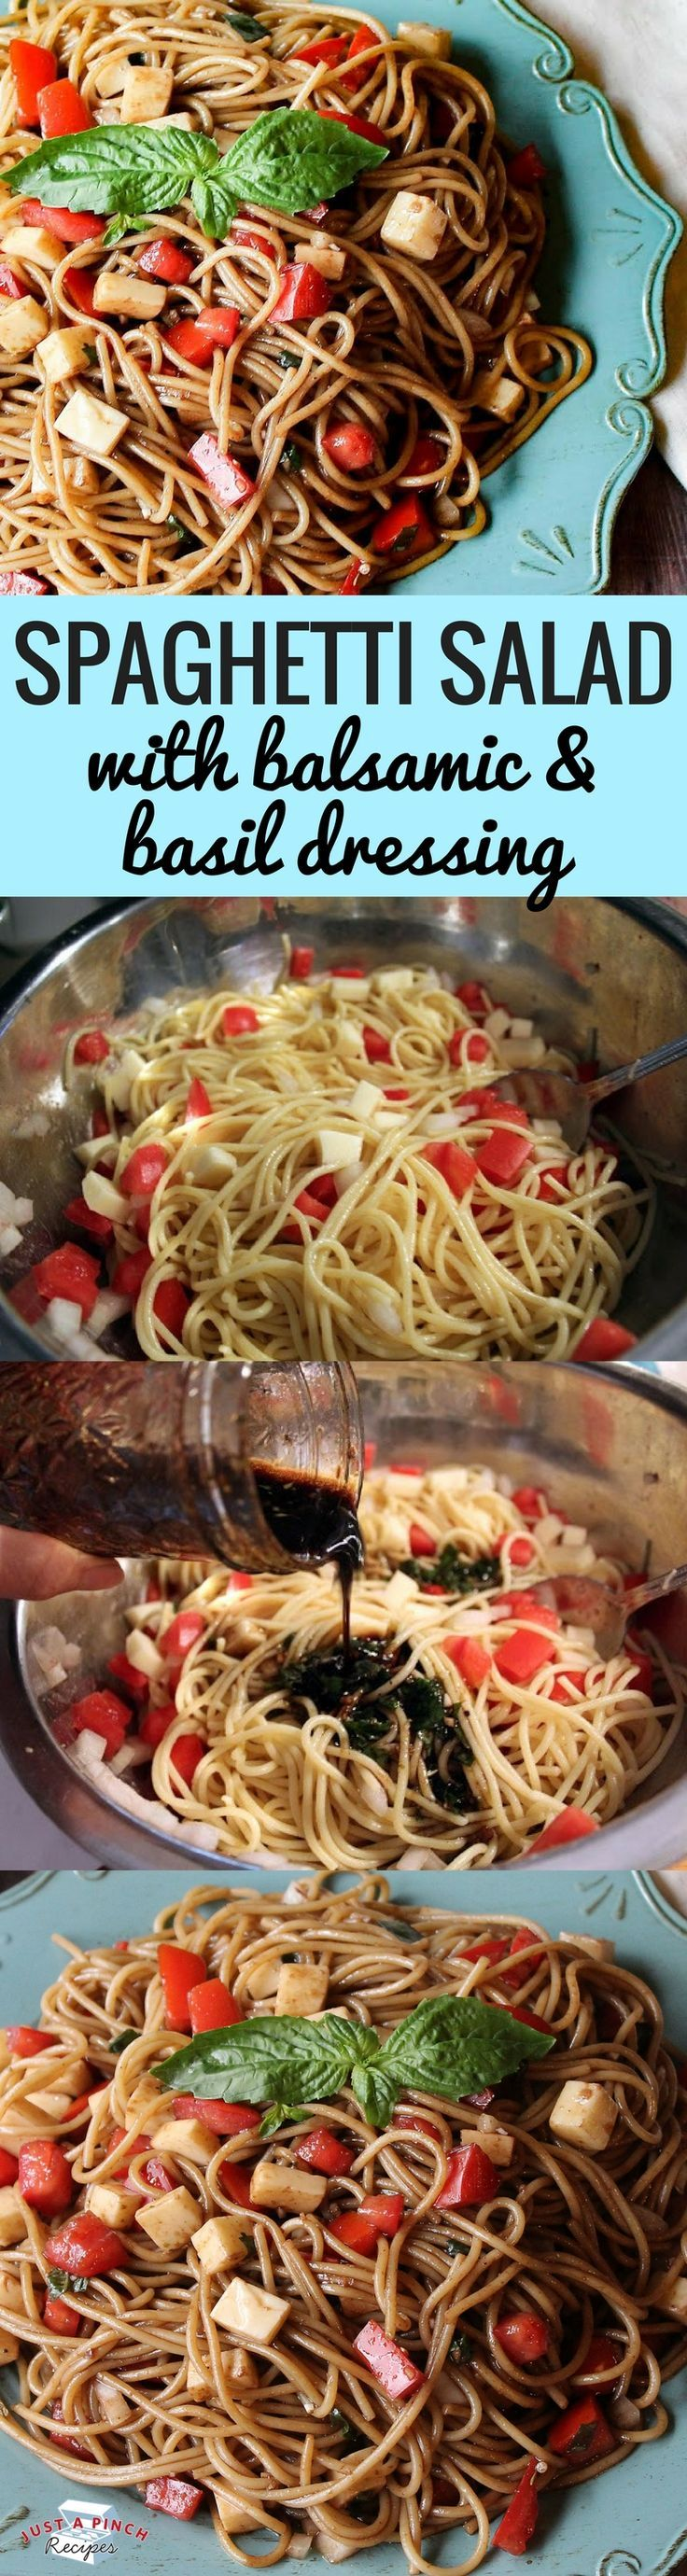 Caprese salad meets spaghetti salad in this delicious summer side dish recipe! Full of fresh tomatoes, creamy mozzarella and basil...yum!